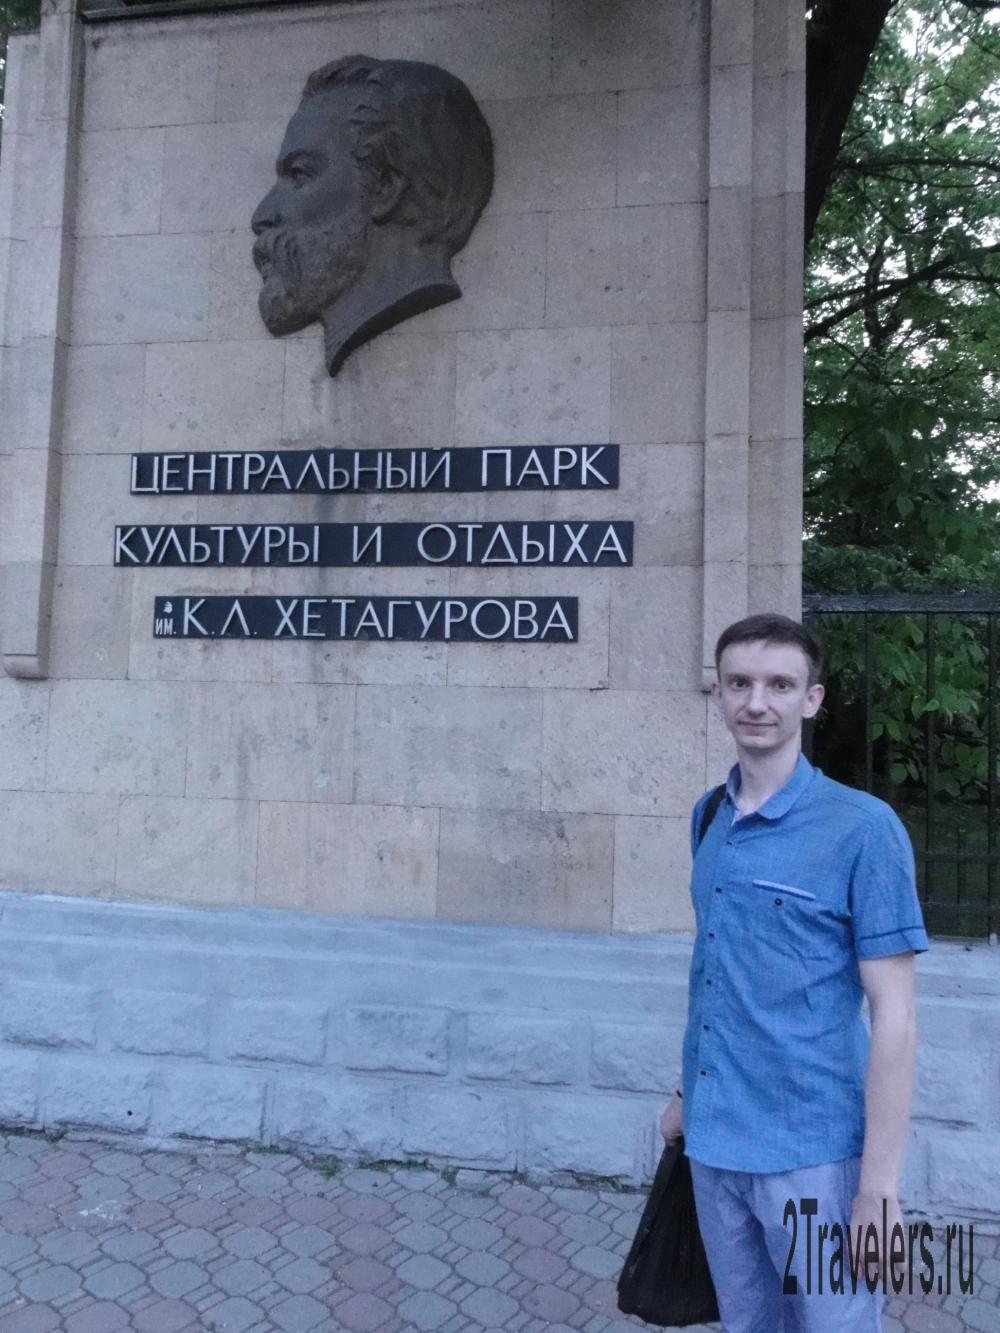 Парк им. К. Хетагурова, Владикавказ